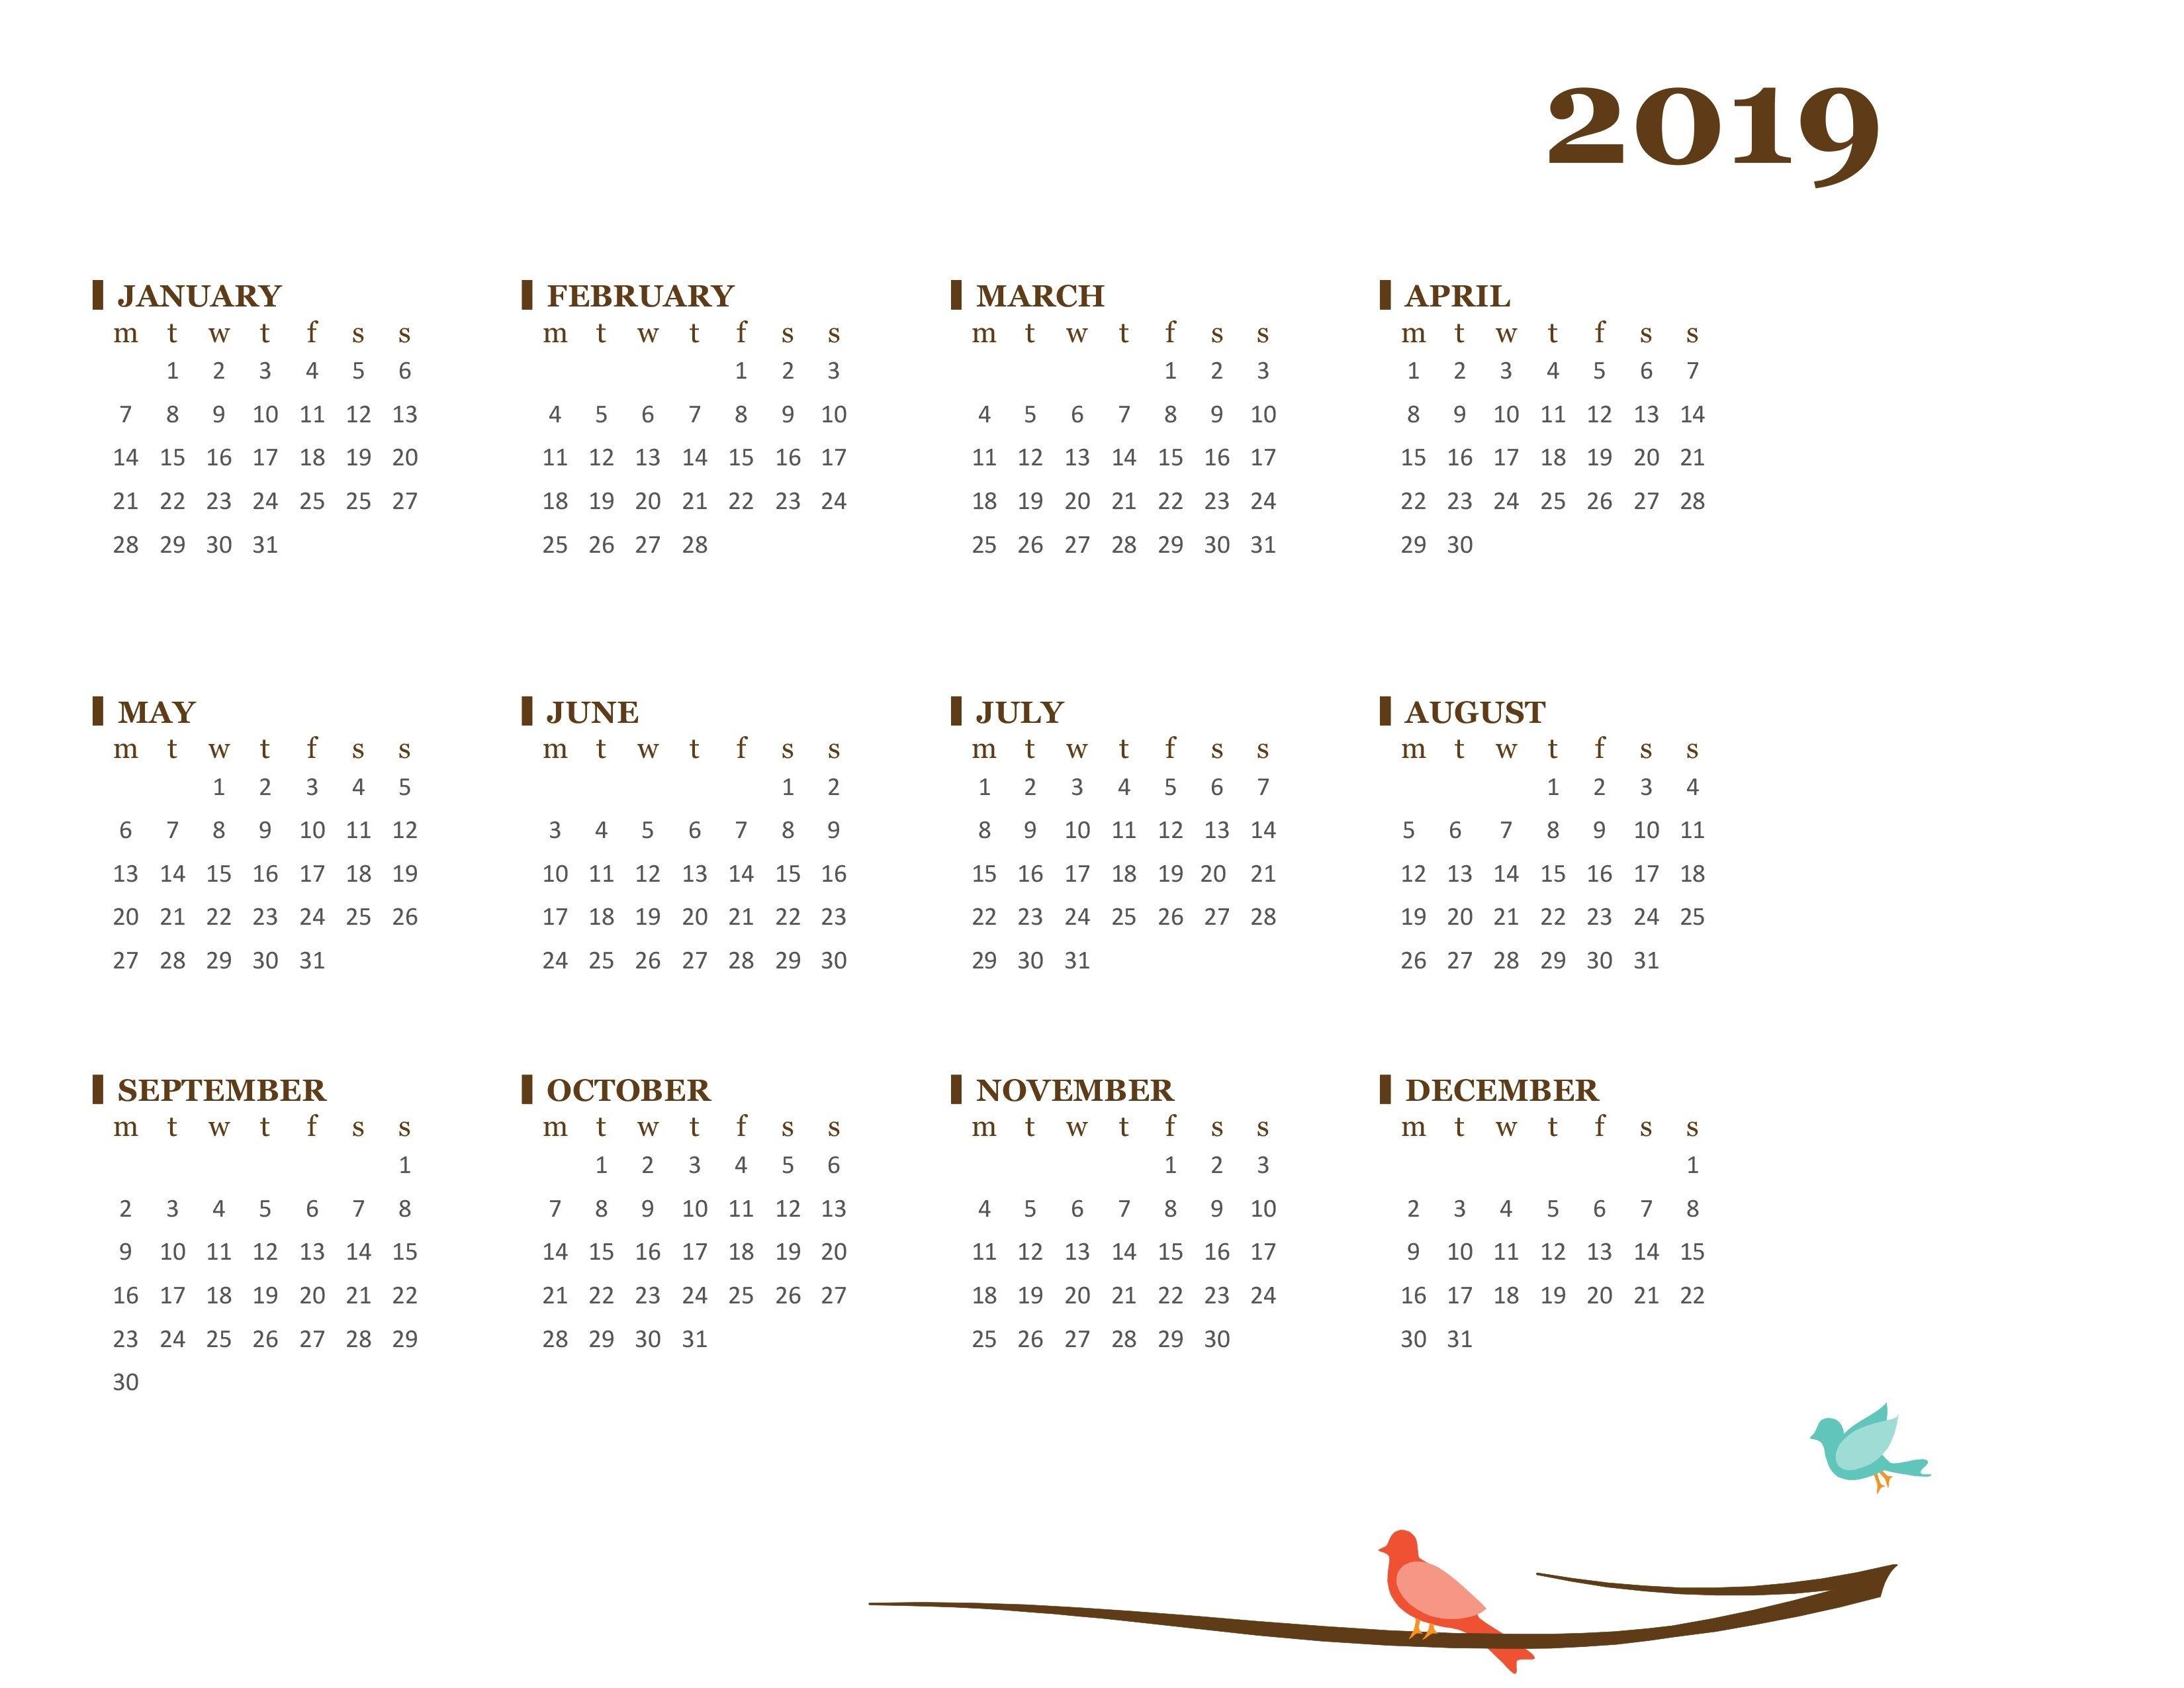 2019 Yearly Calendar (Mon-Sun) Calendar 2019 Annual